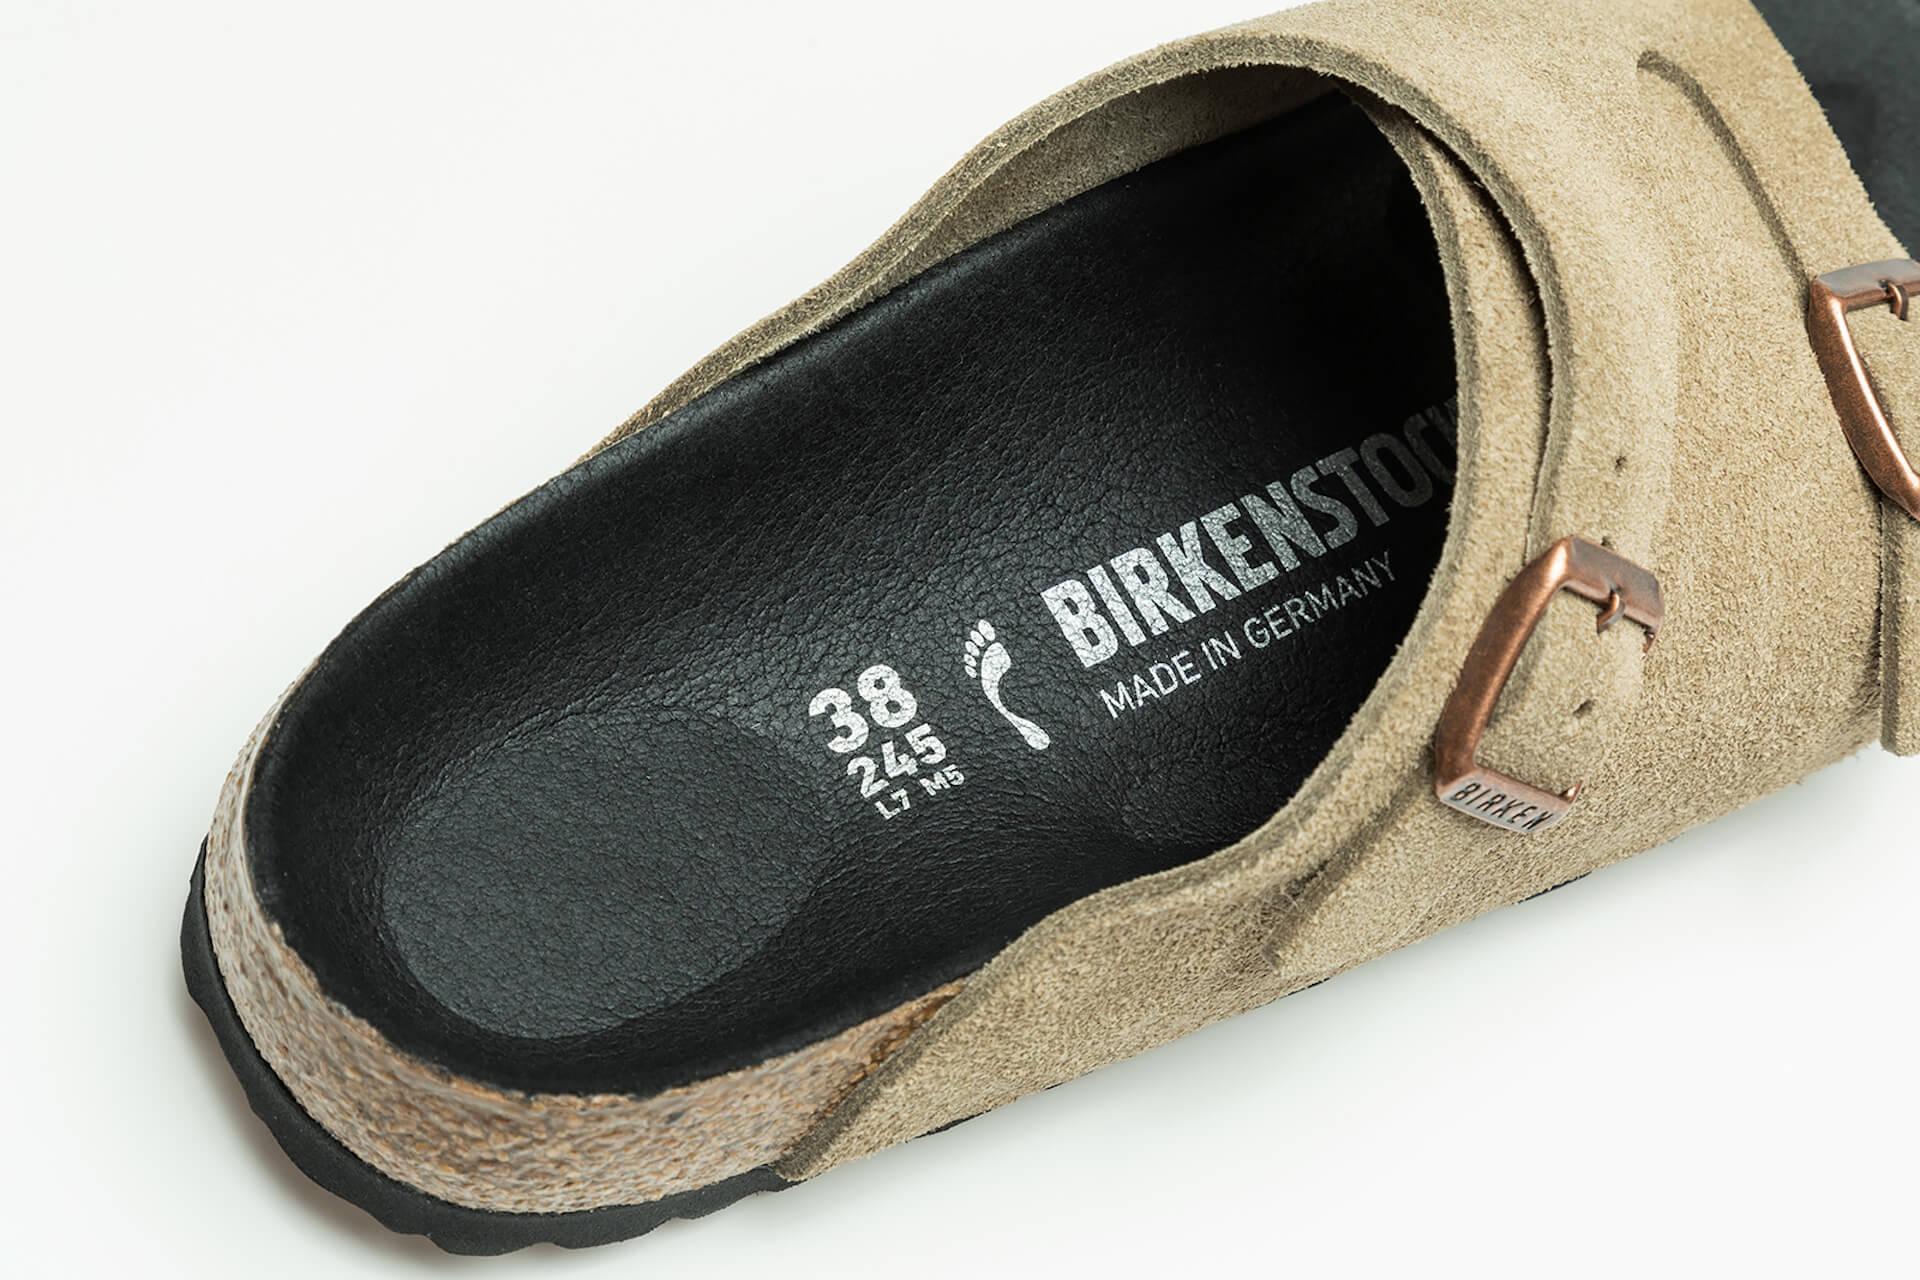 IENA30周年を記念!BIRKENSTOCKの人気サンダル「ZURICH」の別注モデルが発売 life210412_iena_birkenstock_6